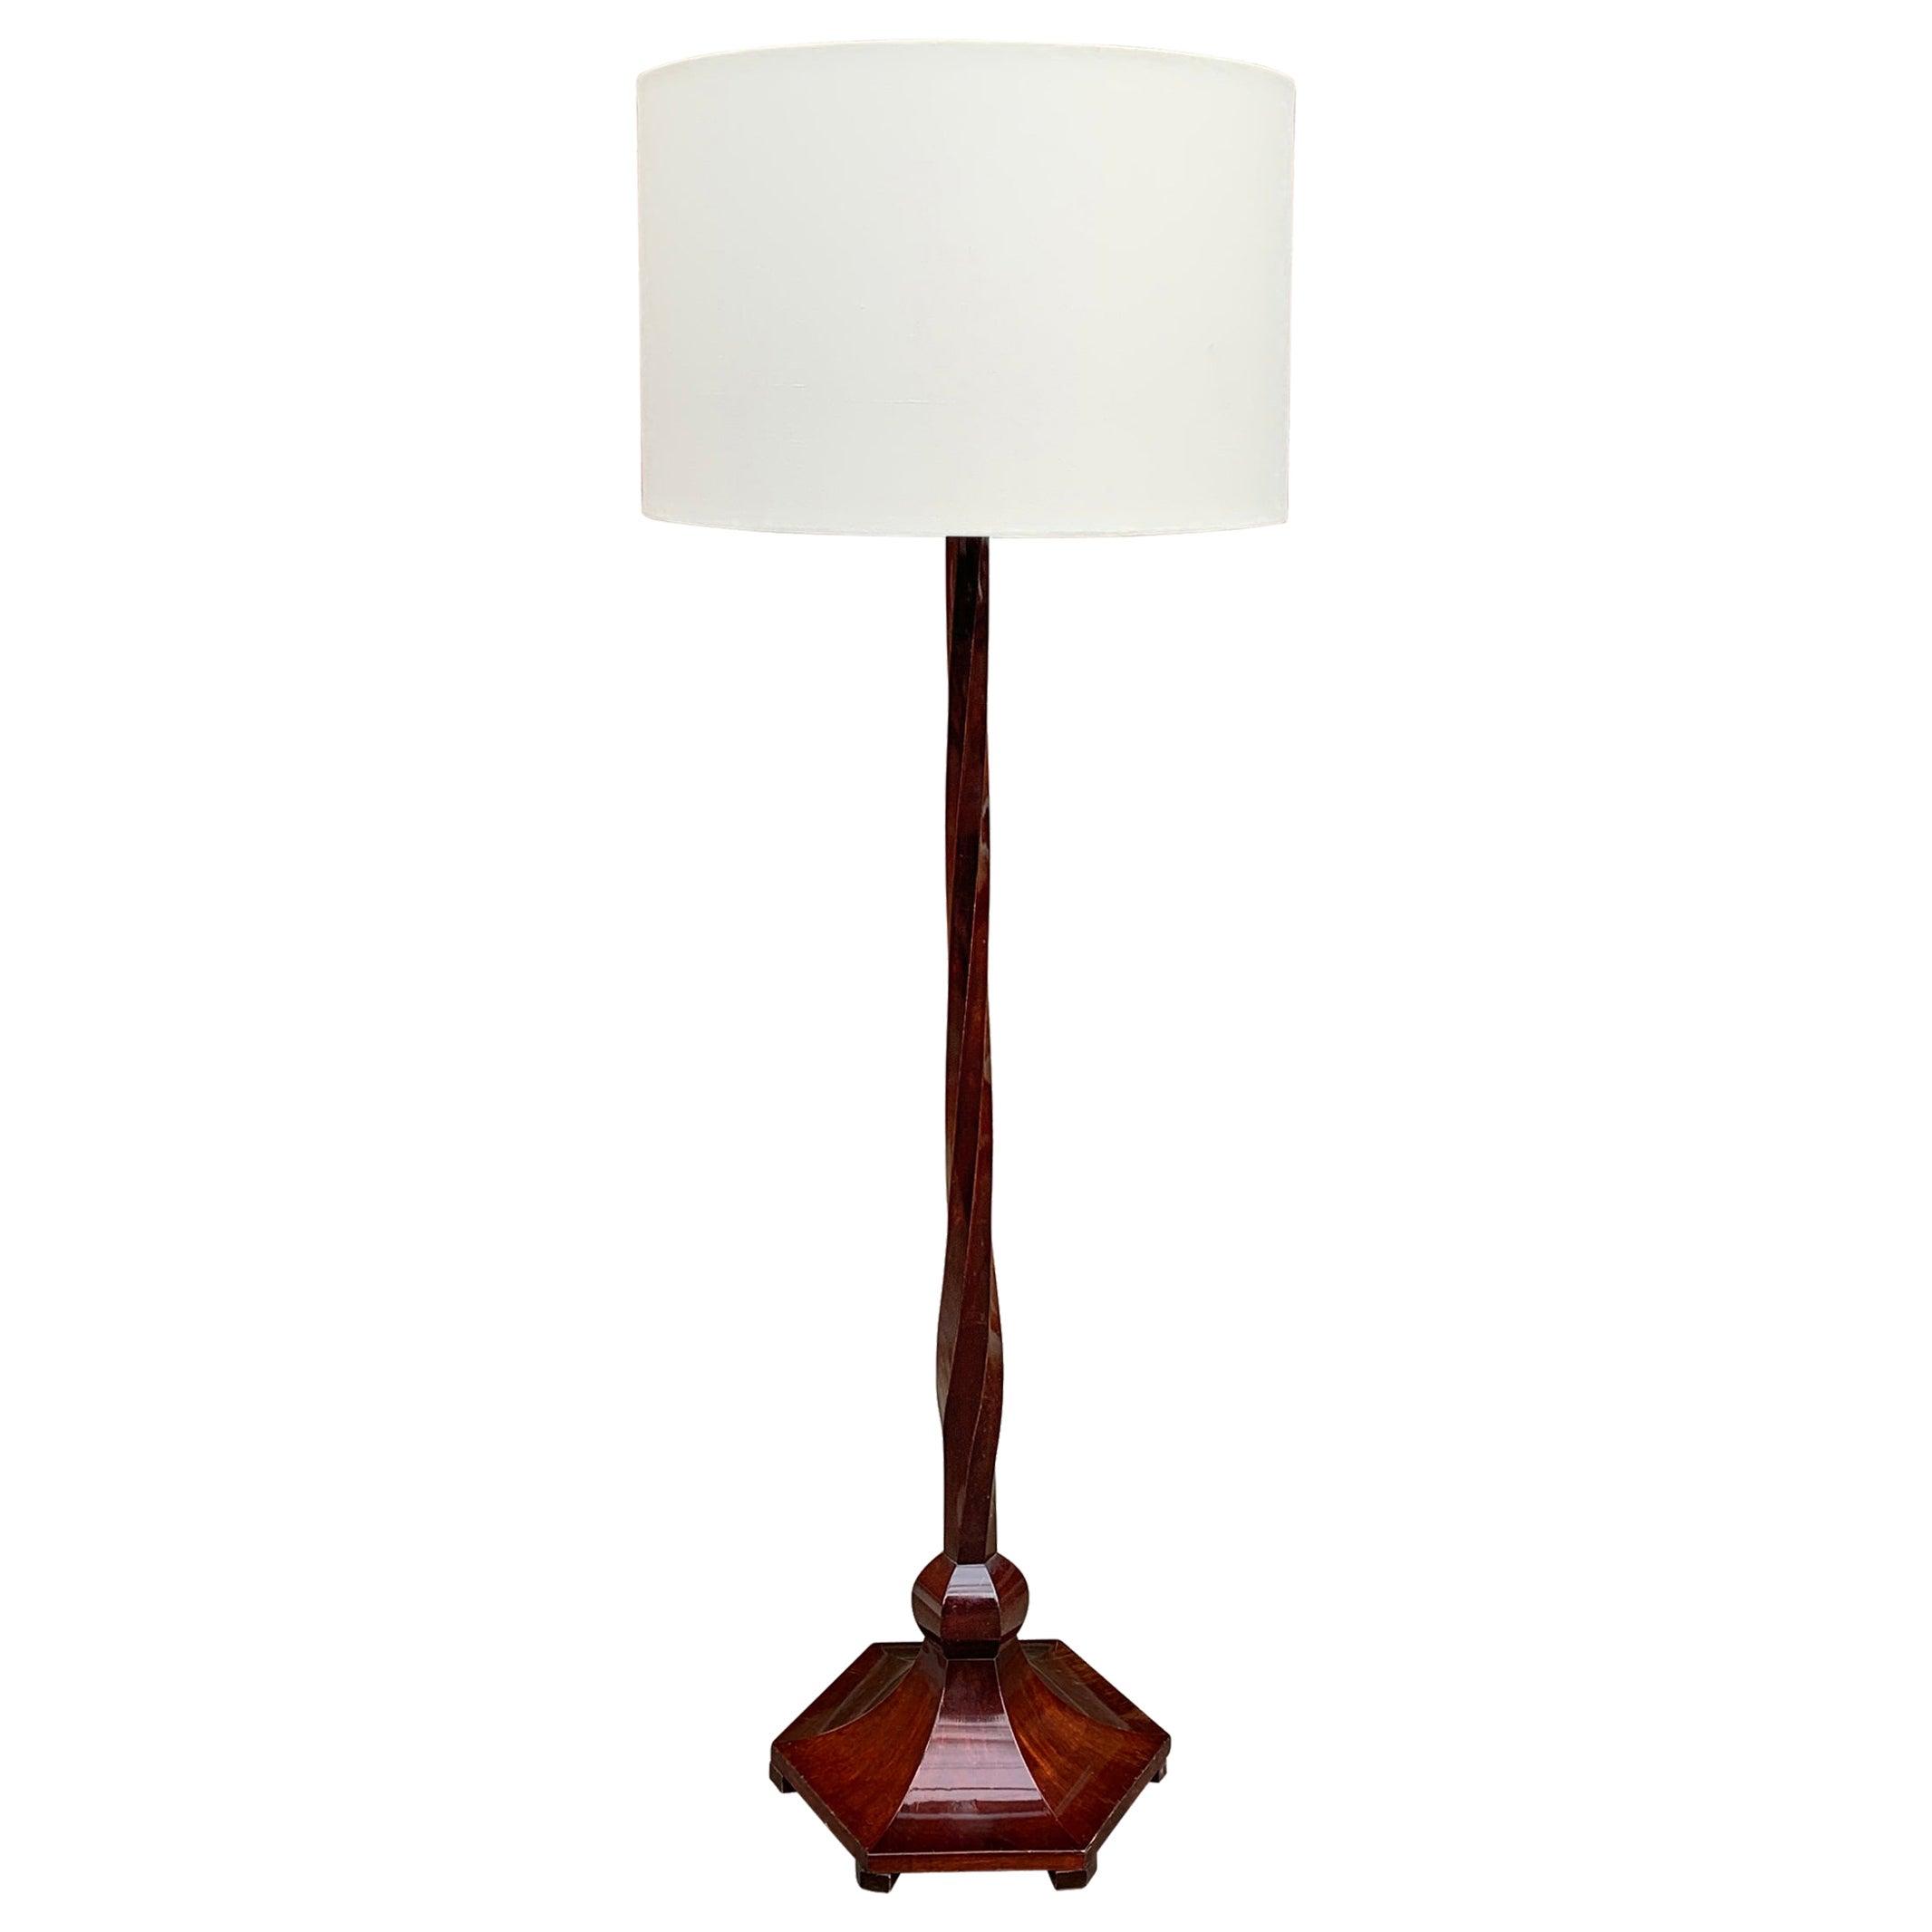 Italian Art Deco Floor Lamp